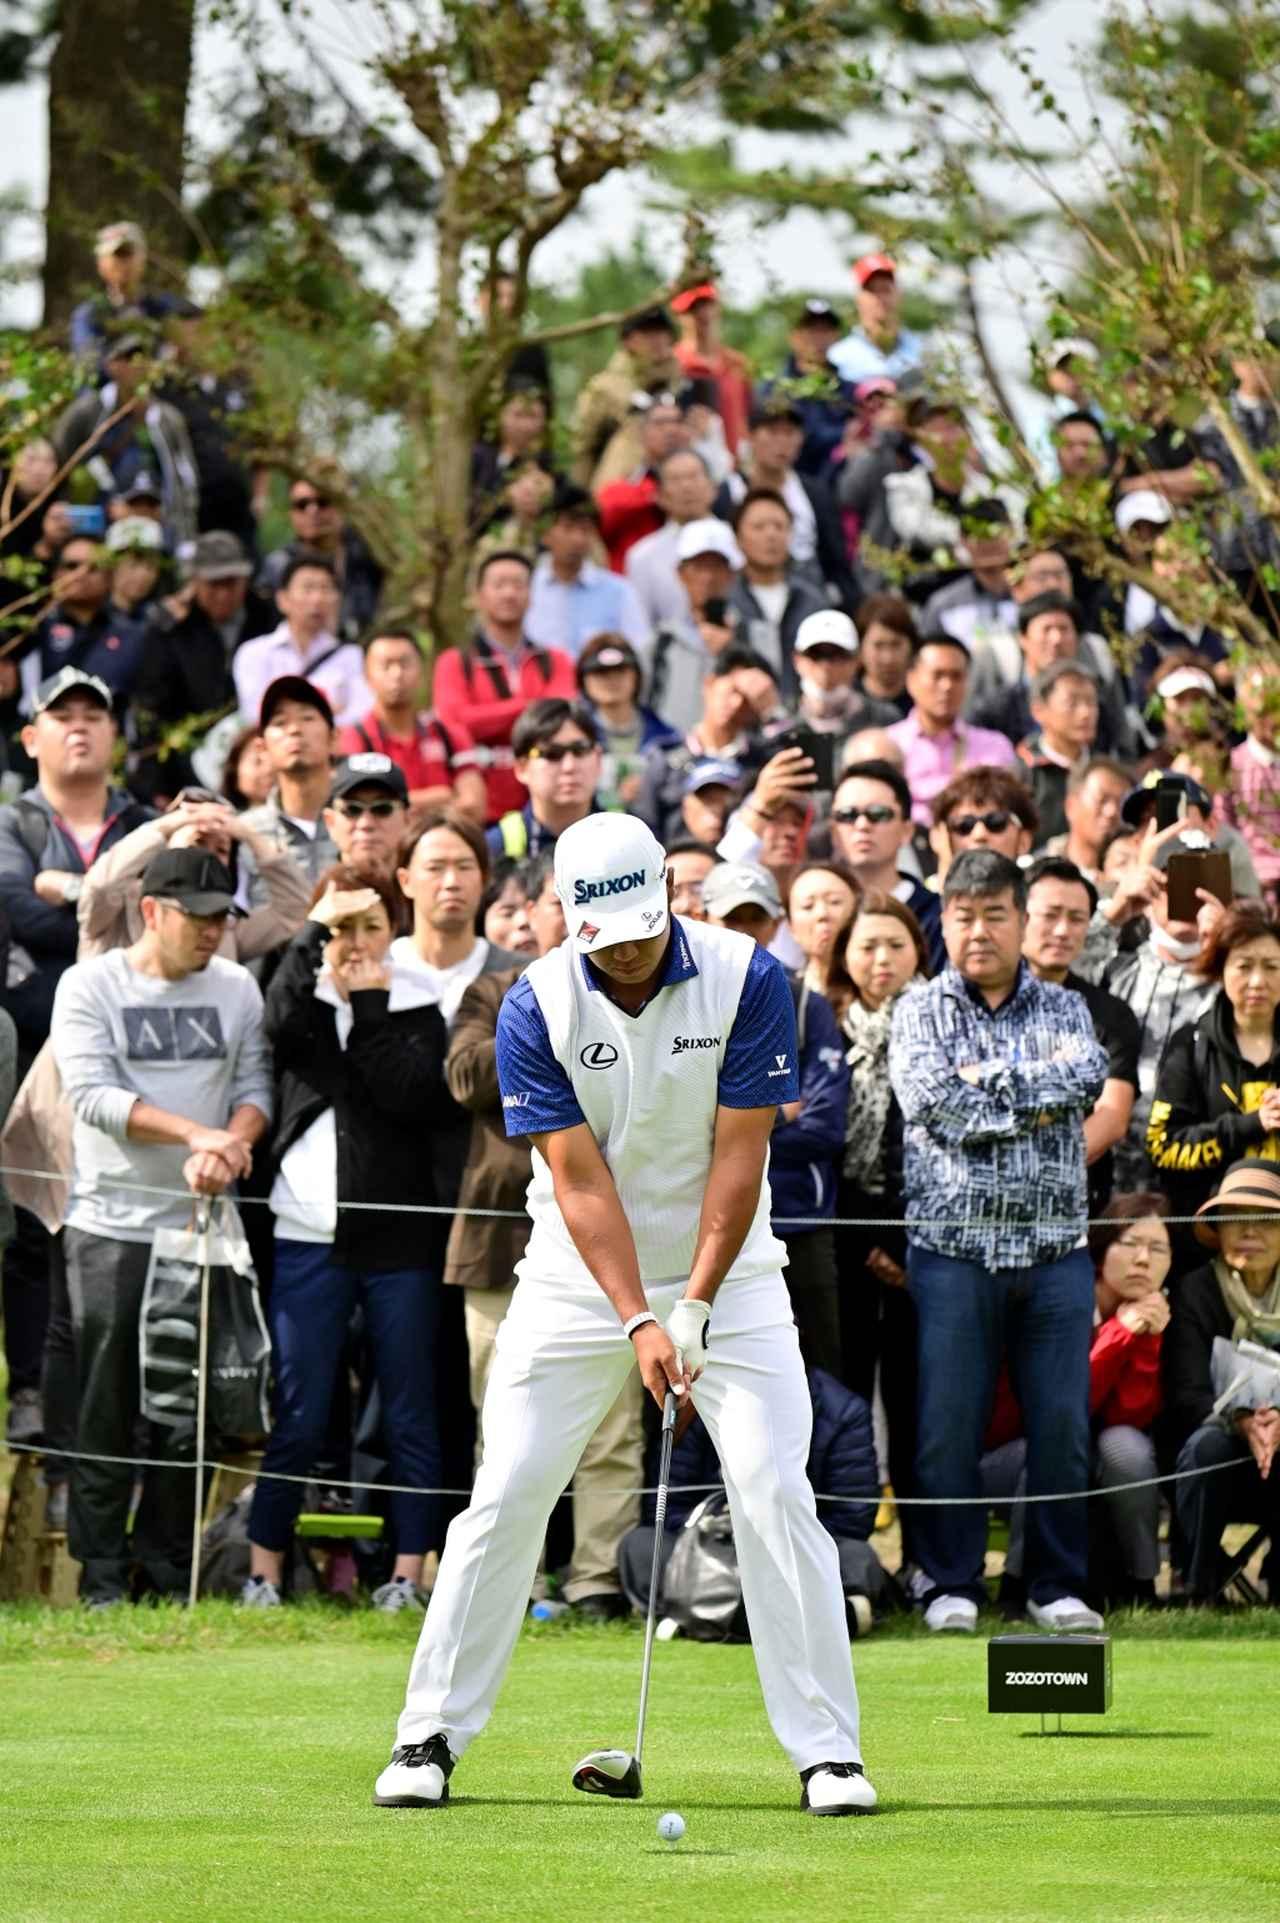 Images : 1番目の画像 - 松山英樹のドライバー連続写真 - みんなのゴルフダイジェスト